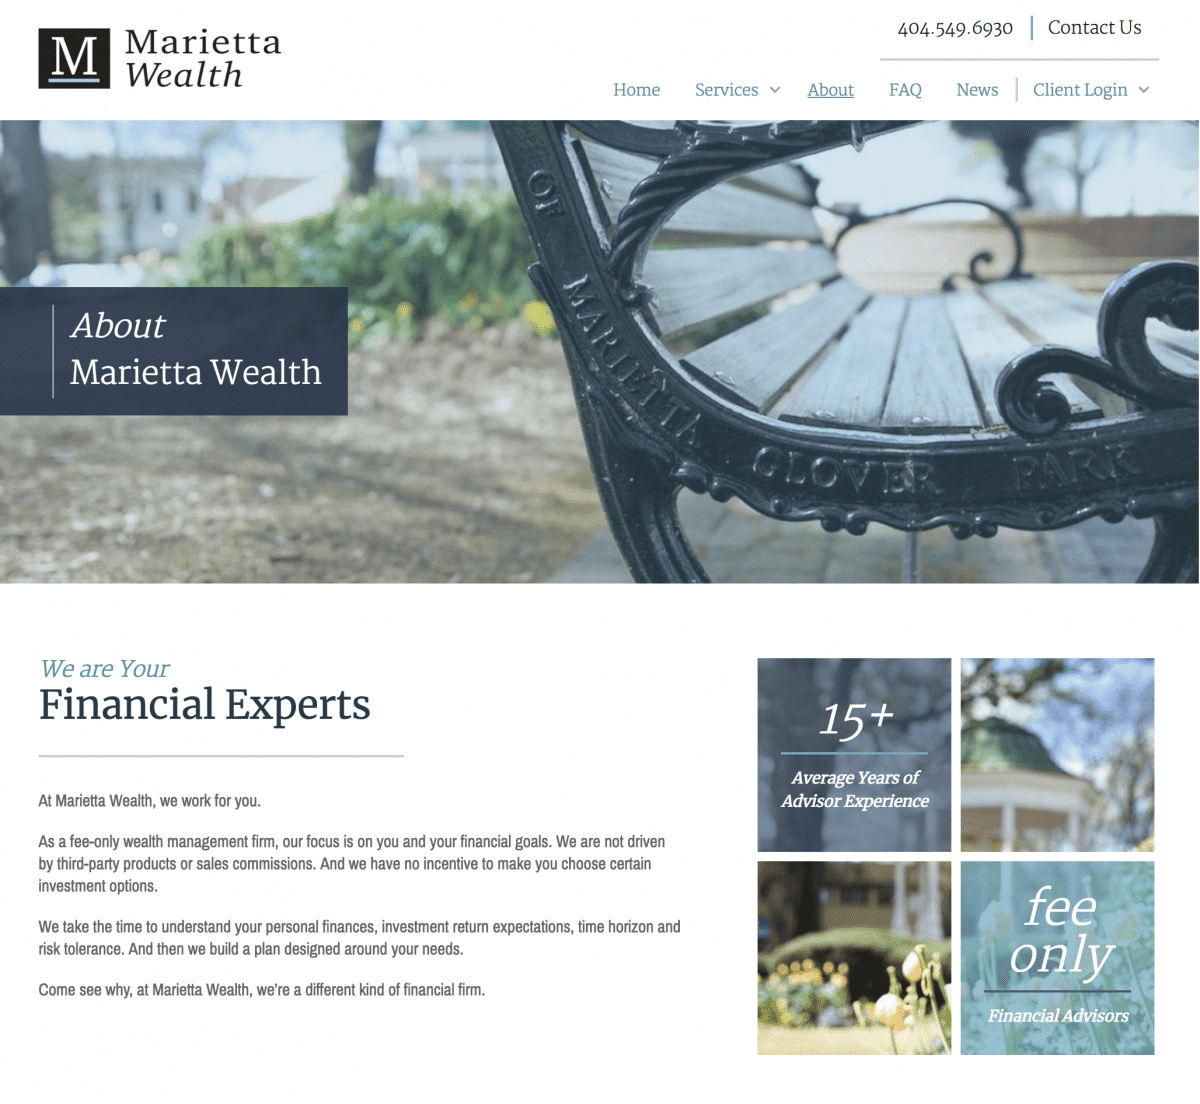 Image of website for Marietta Wealth